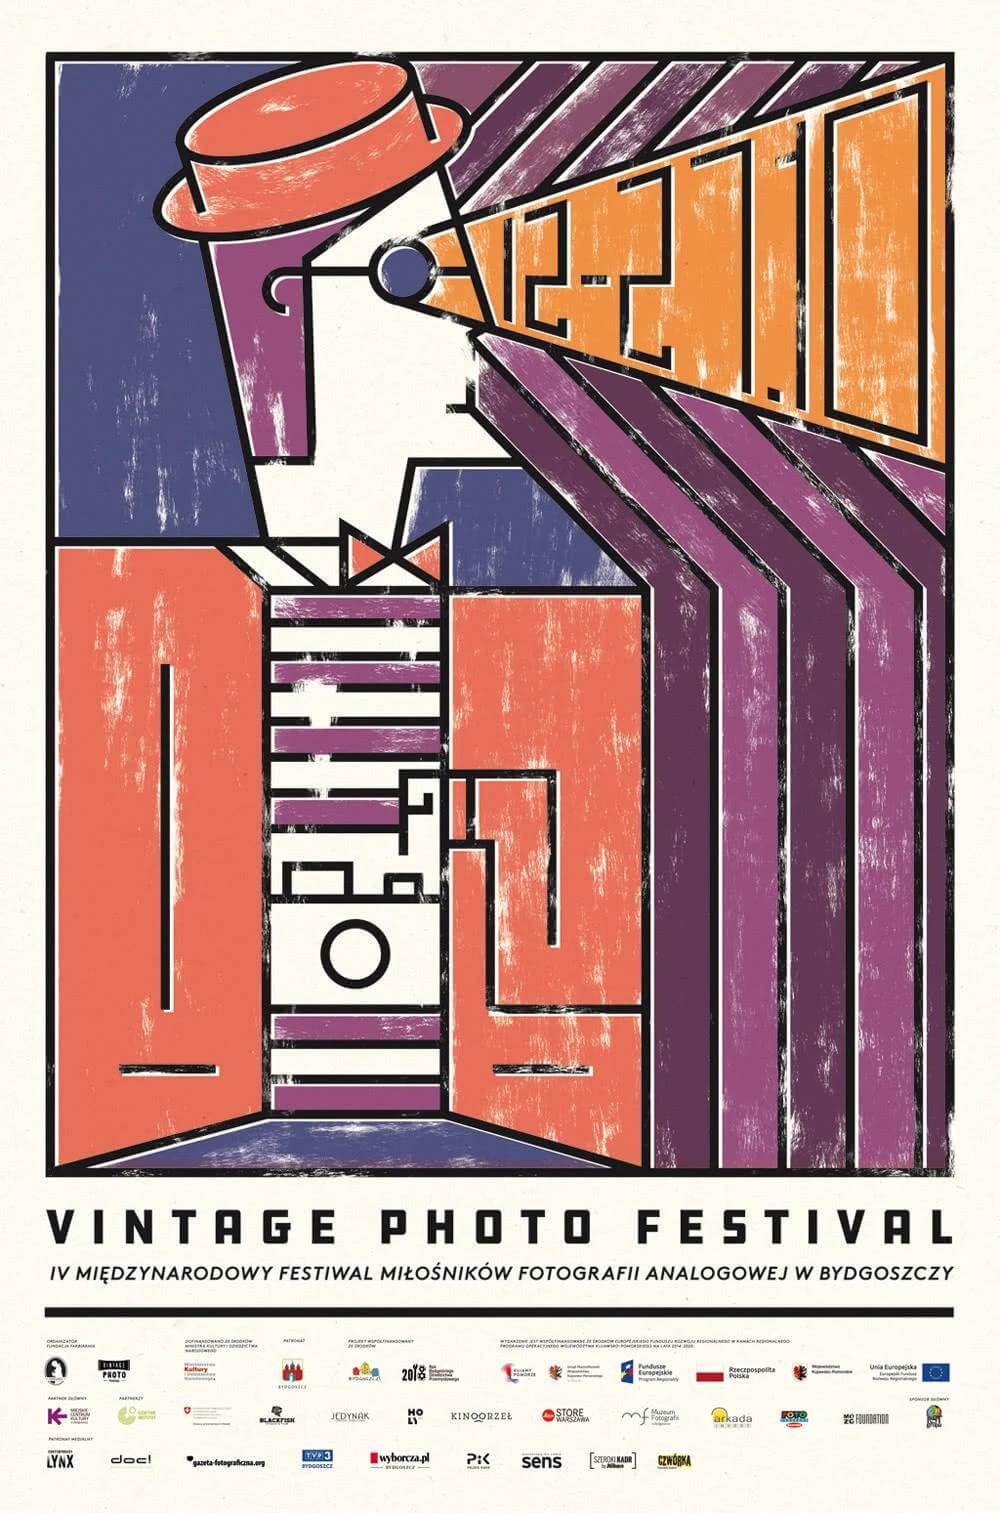 4. Vintage Photo Festival 2018